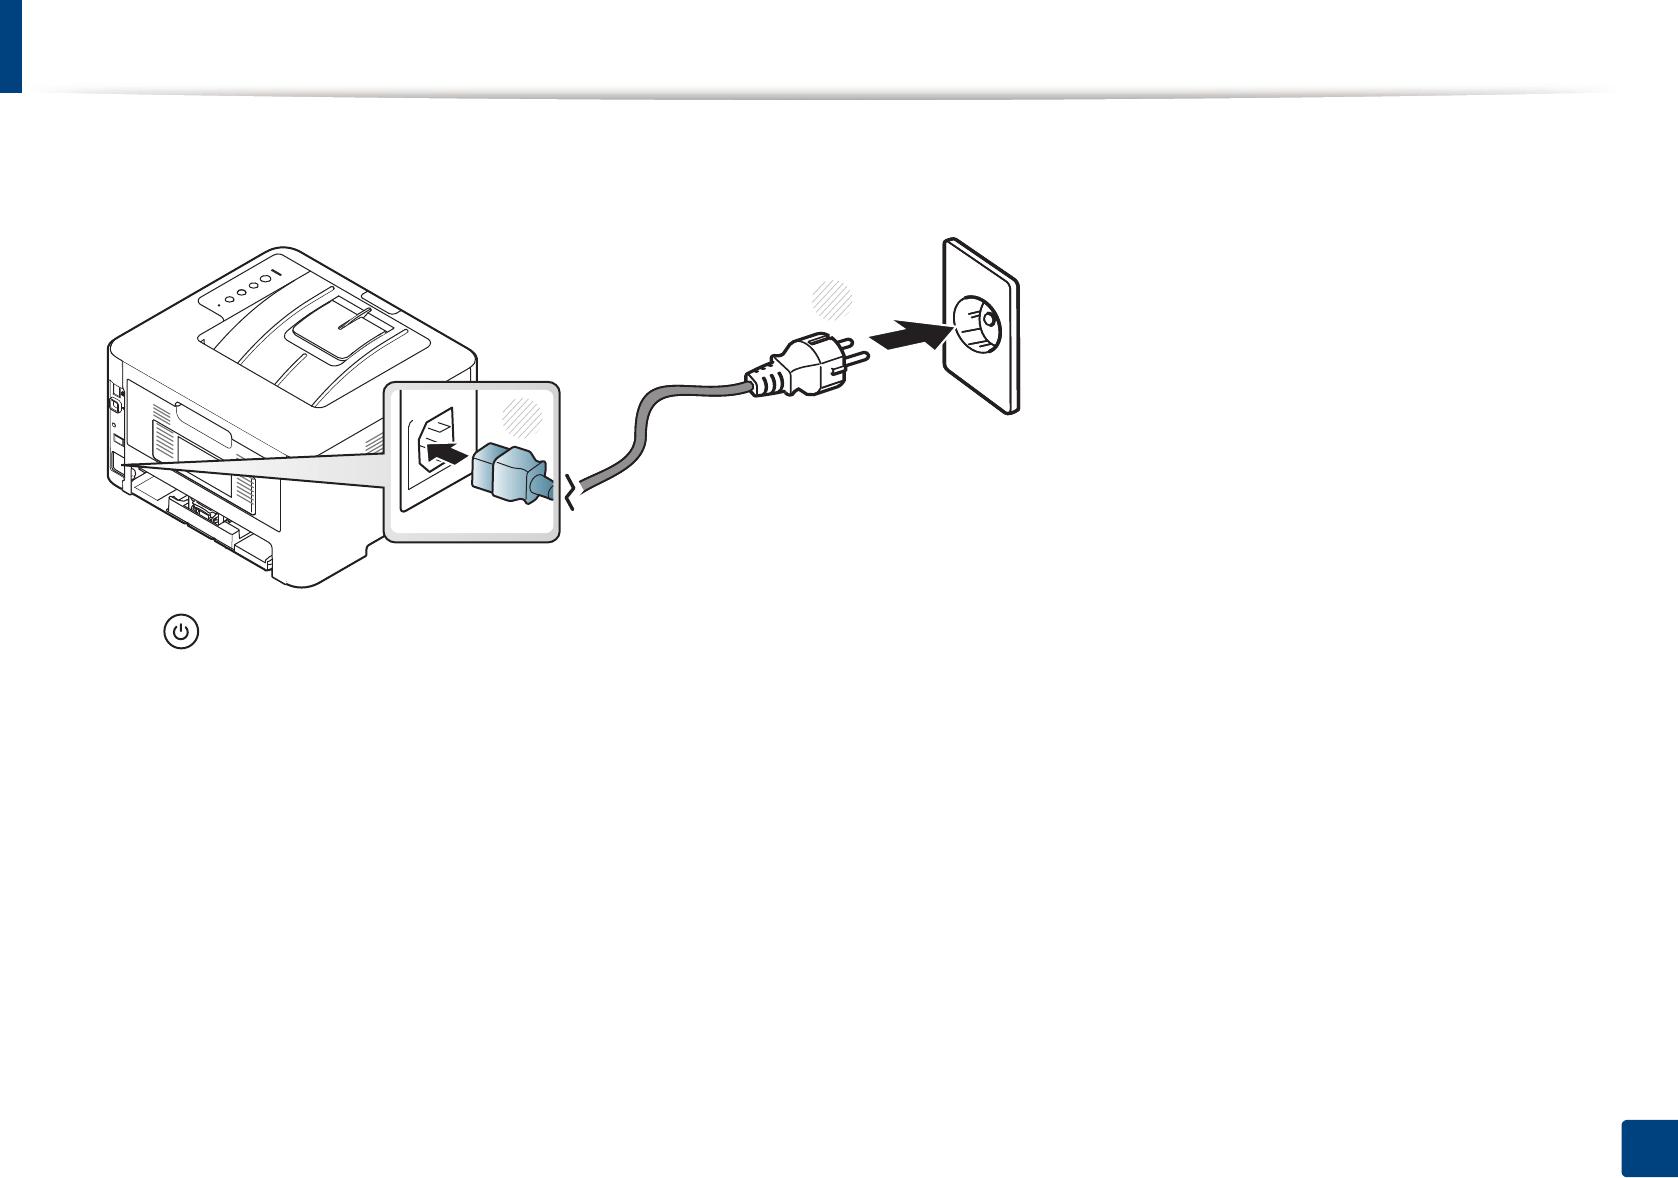 Samsung M262x, M282x, M283x series Turning on the machine